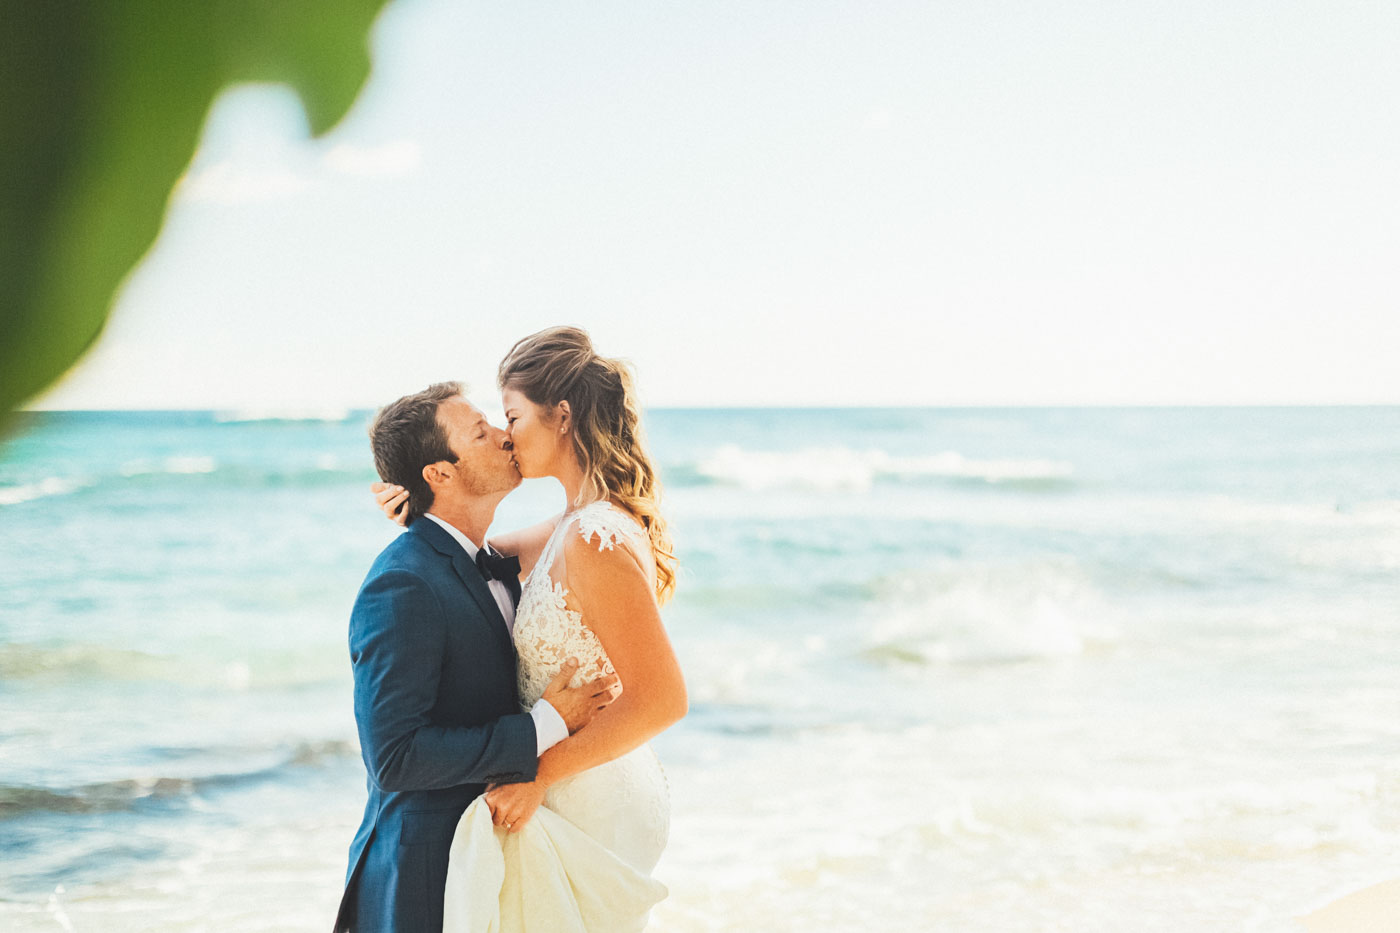 maui wedding photographer_44.jpg